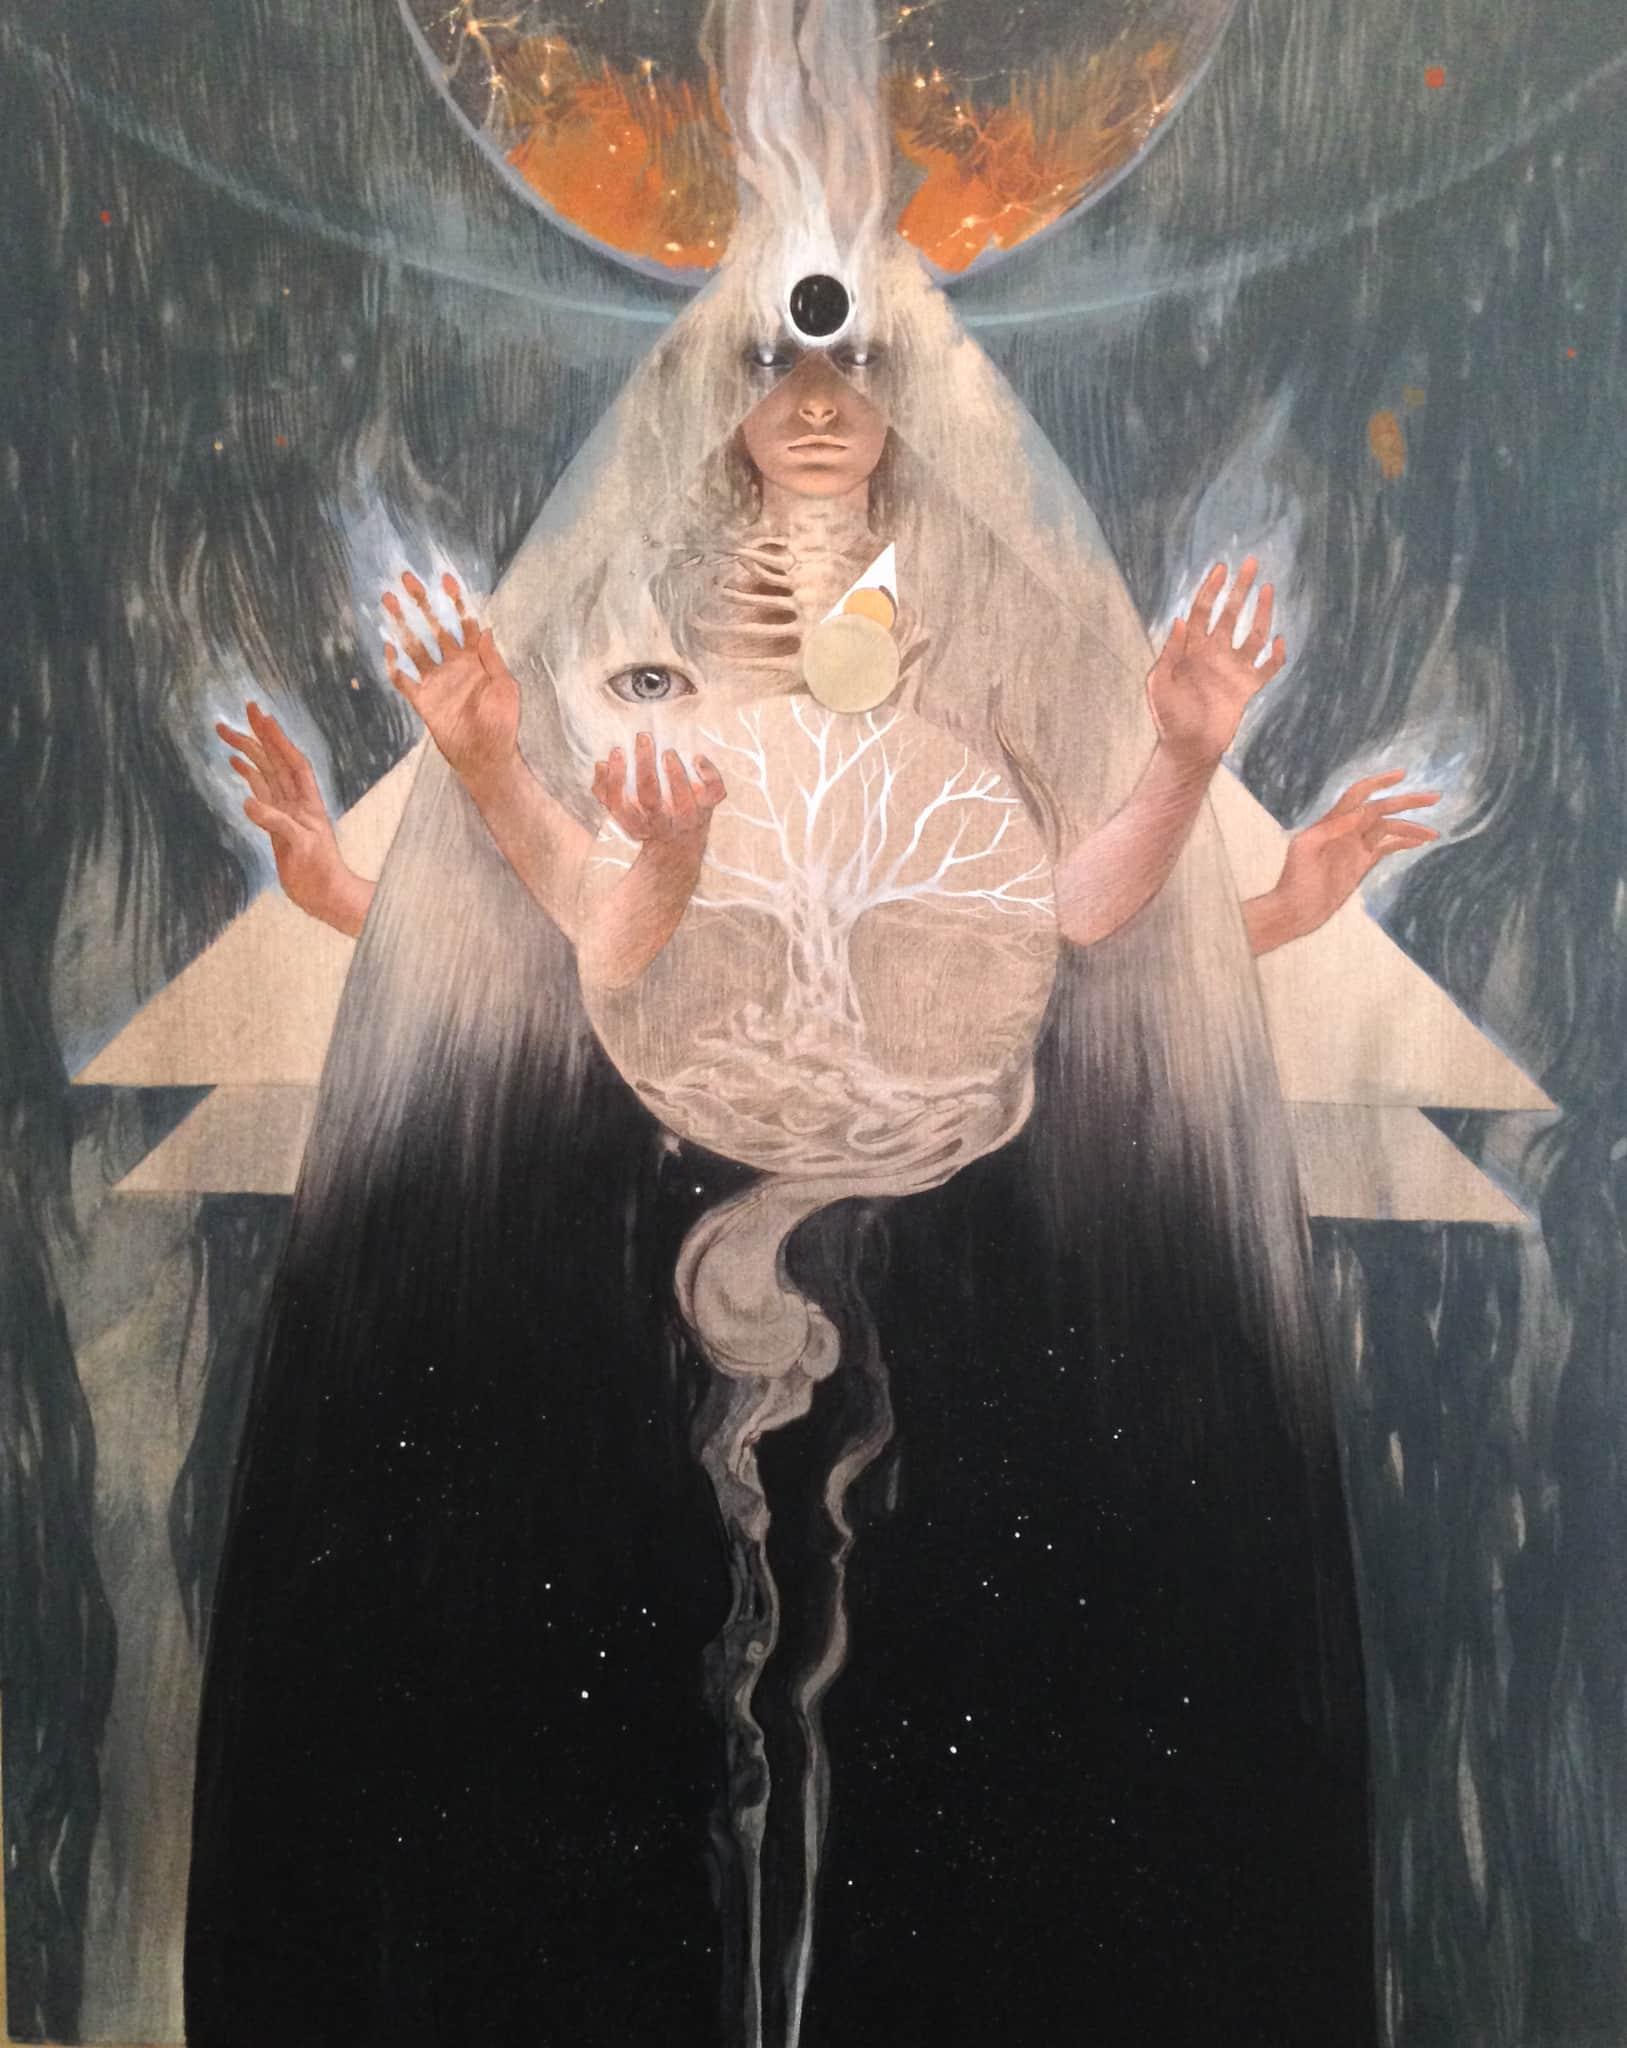 L. Bustamante Art